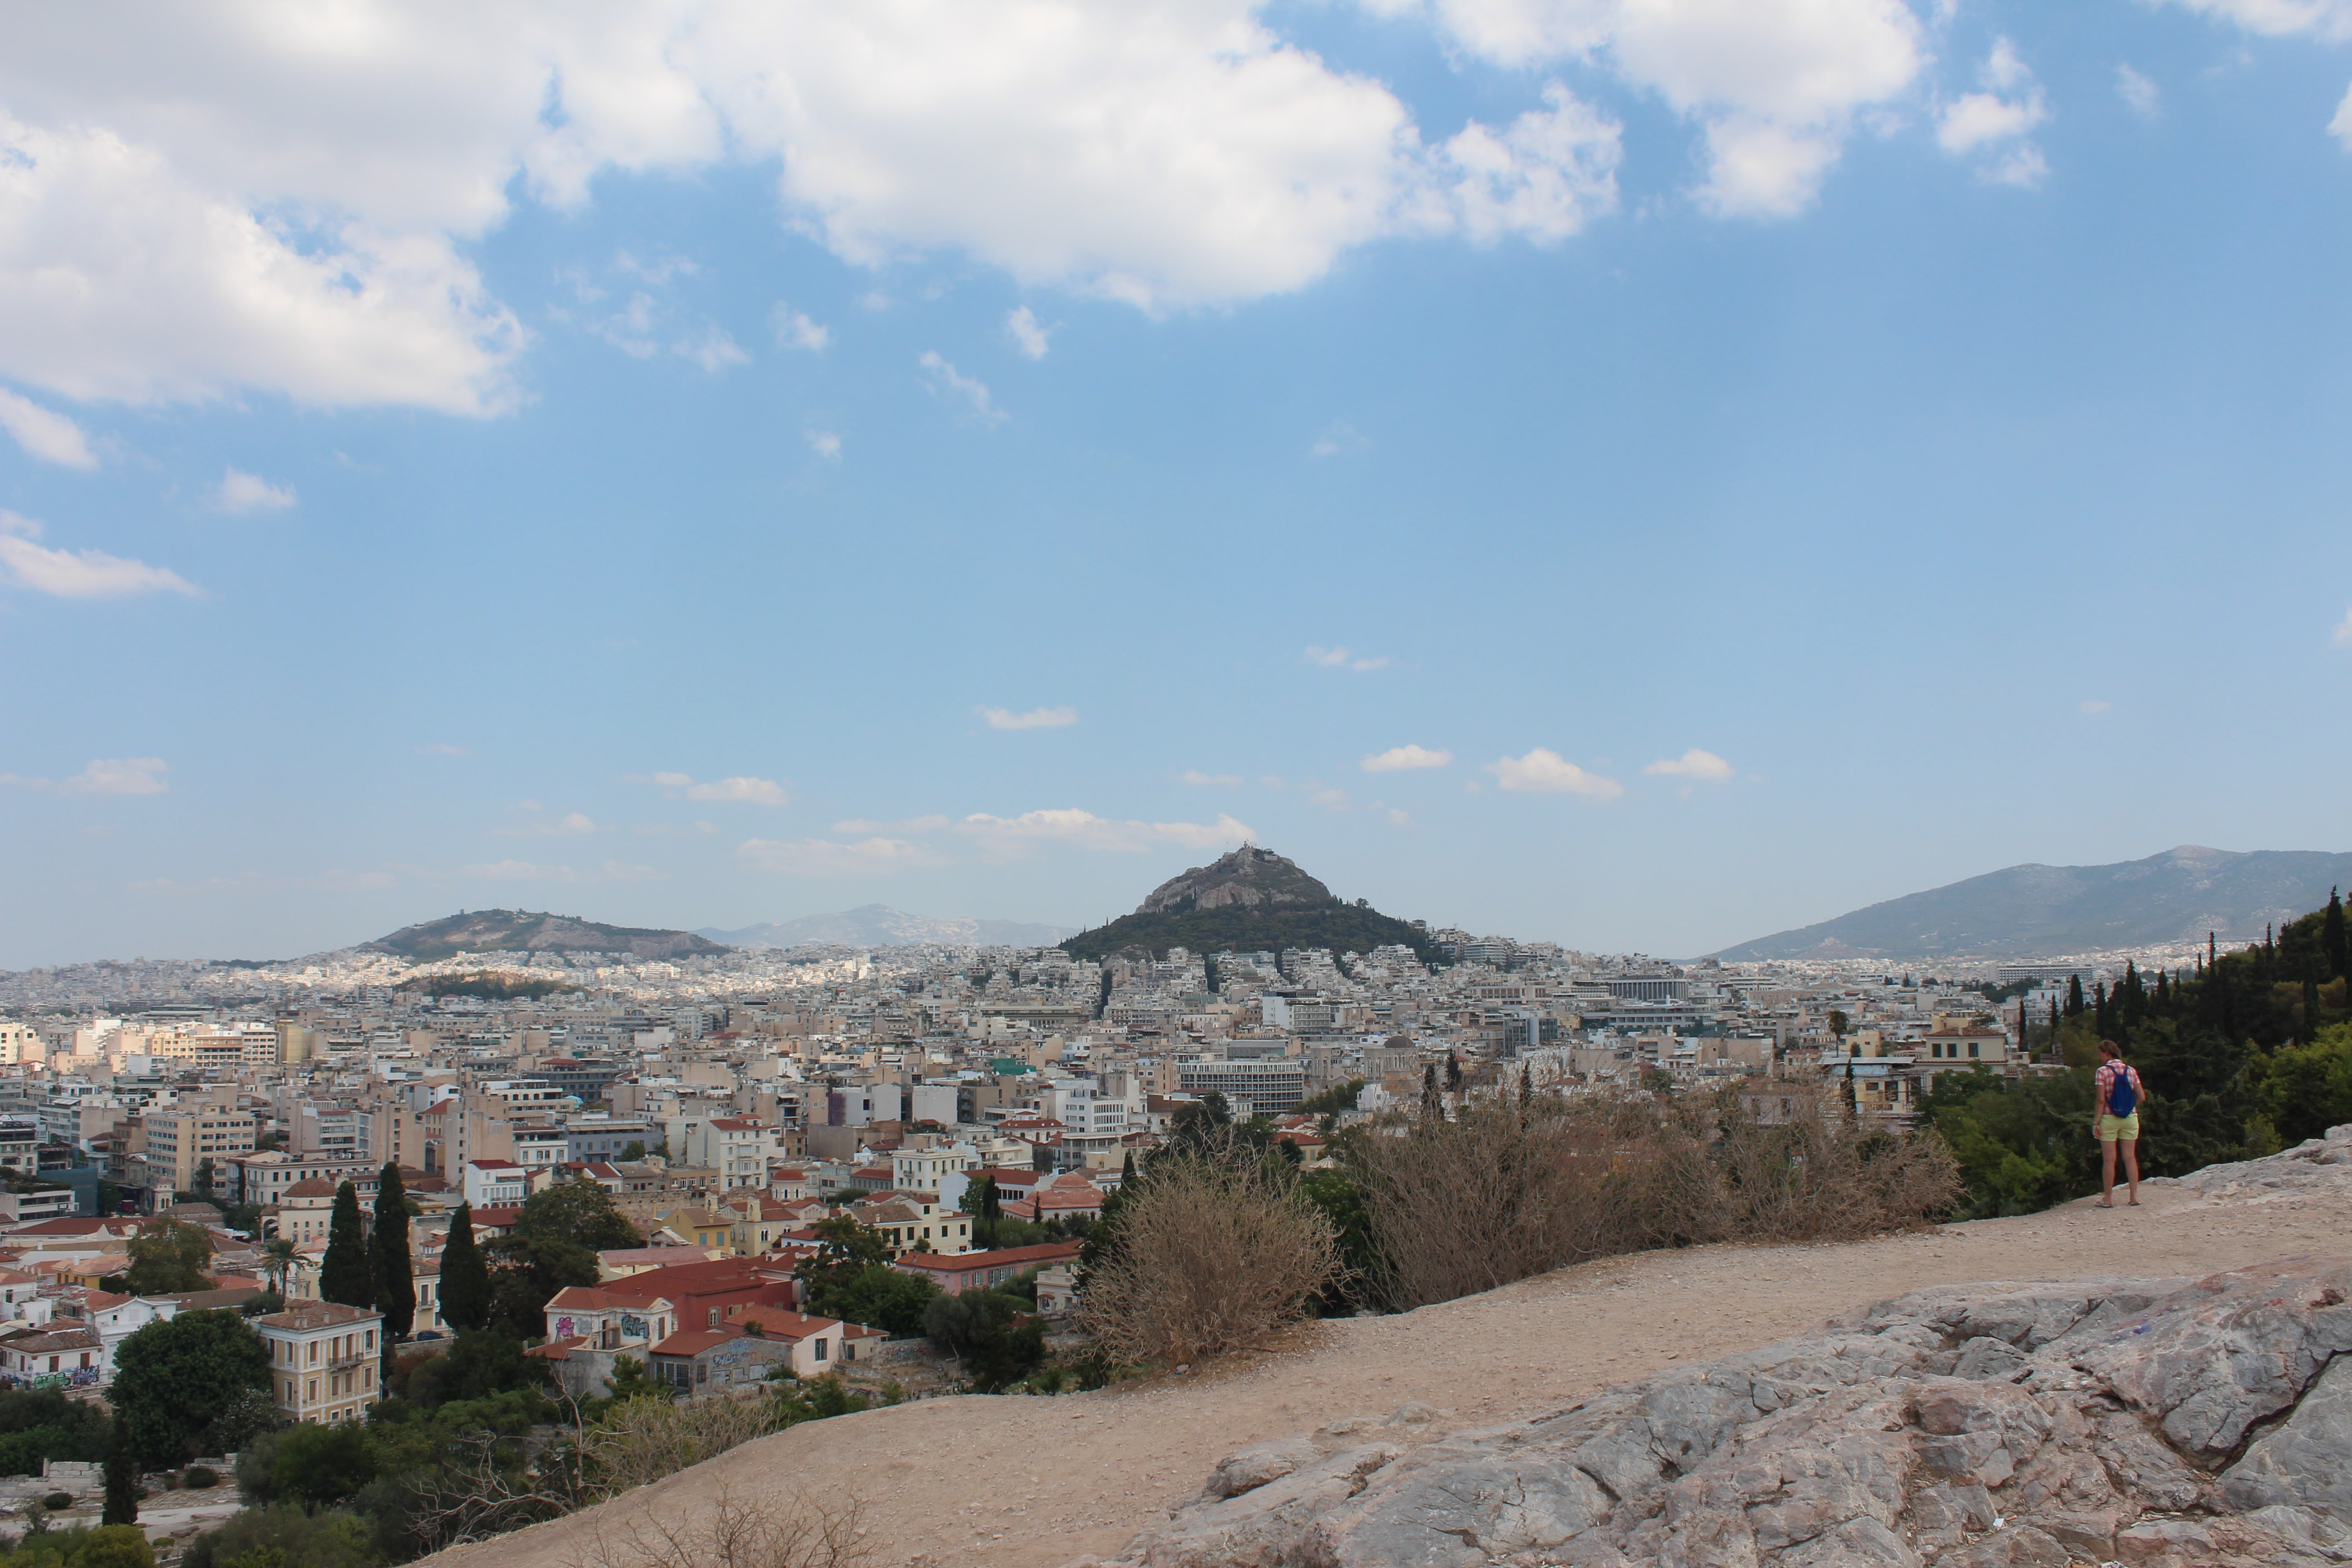 The skyline of Athens, Greece